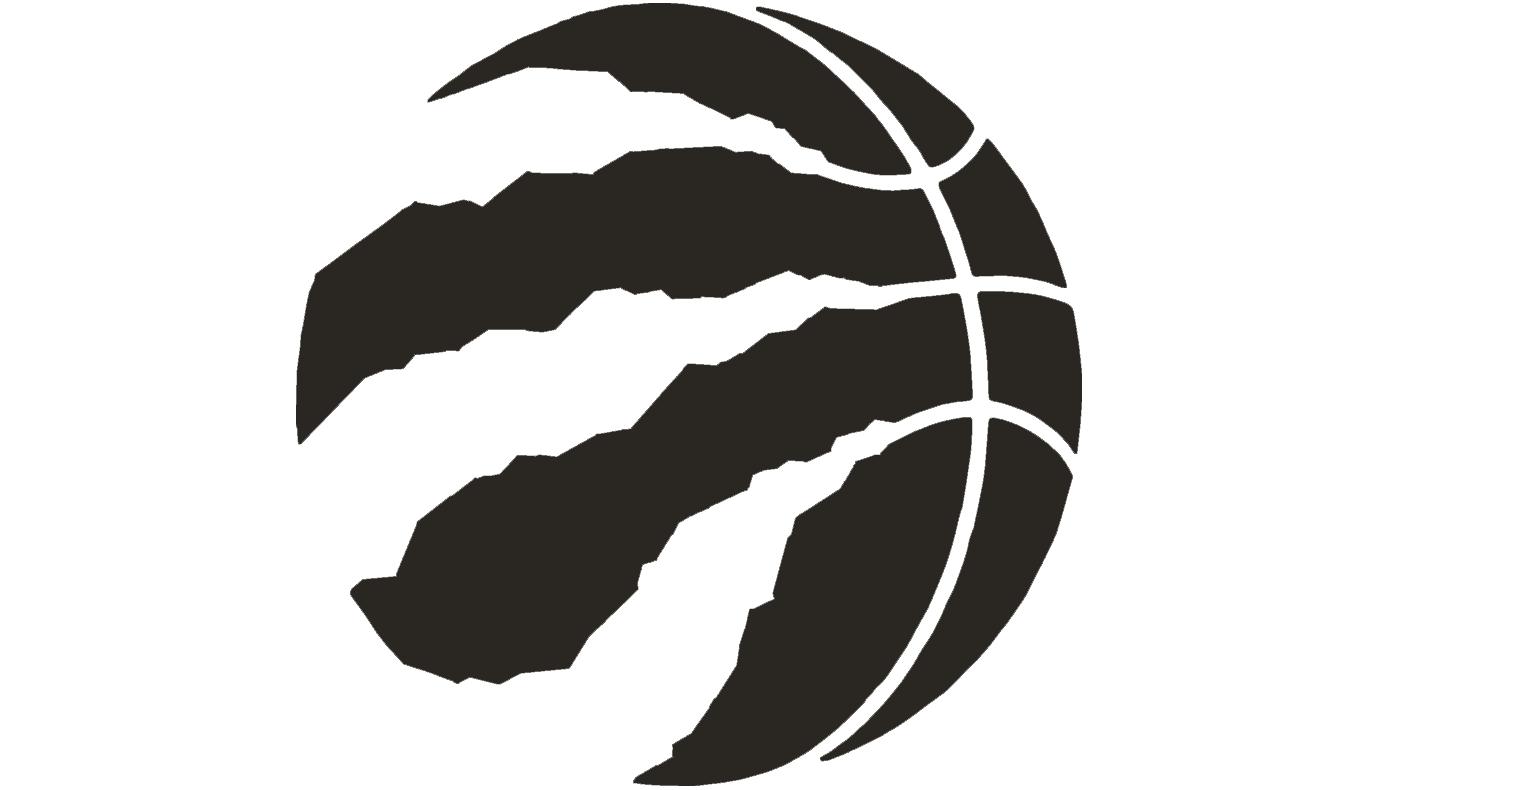 Toronto Raptors - Partial logo 2